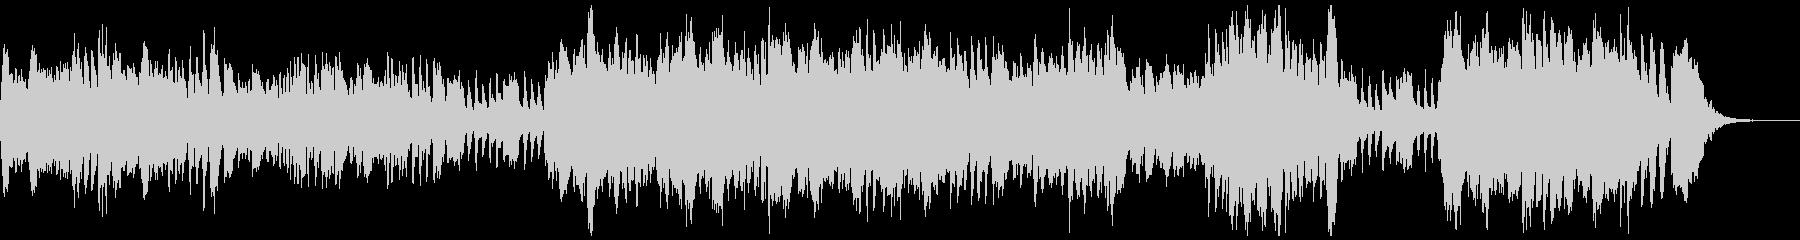 BWV1067/2『ロンドー』バッハの未再生の波形